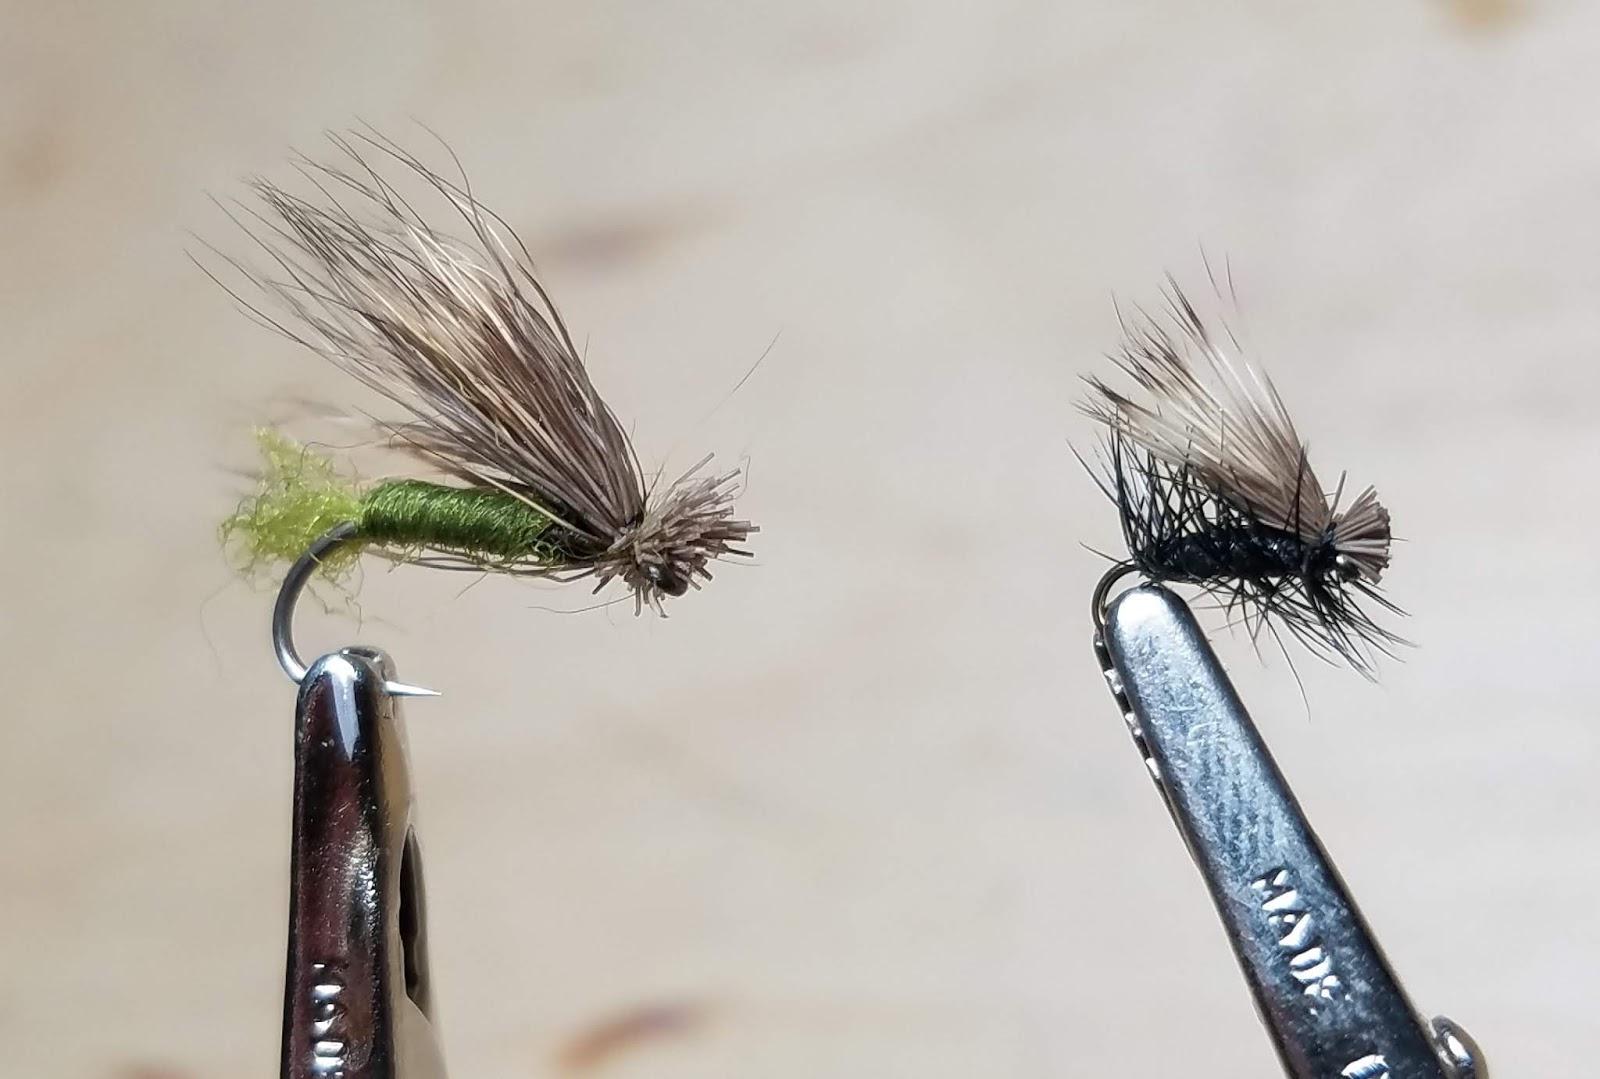 silver rib Fly Fishing Flies 12 Zebra Midges size 20 red head black body